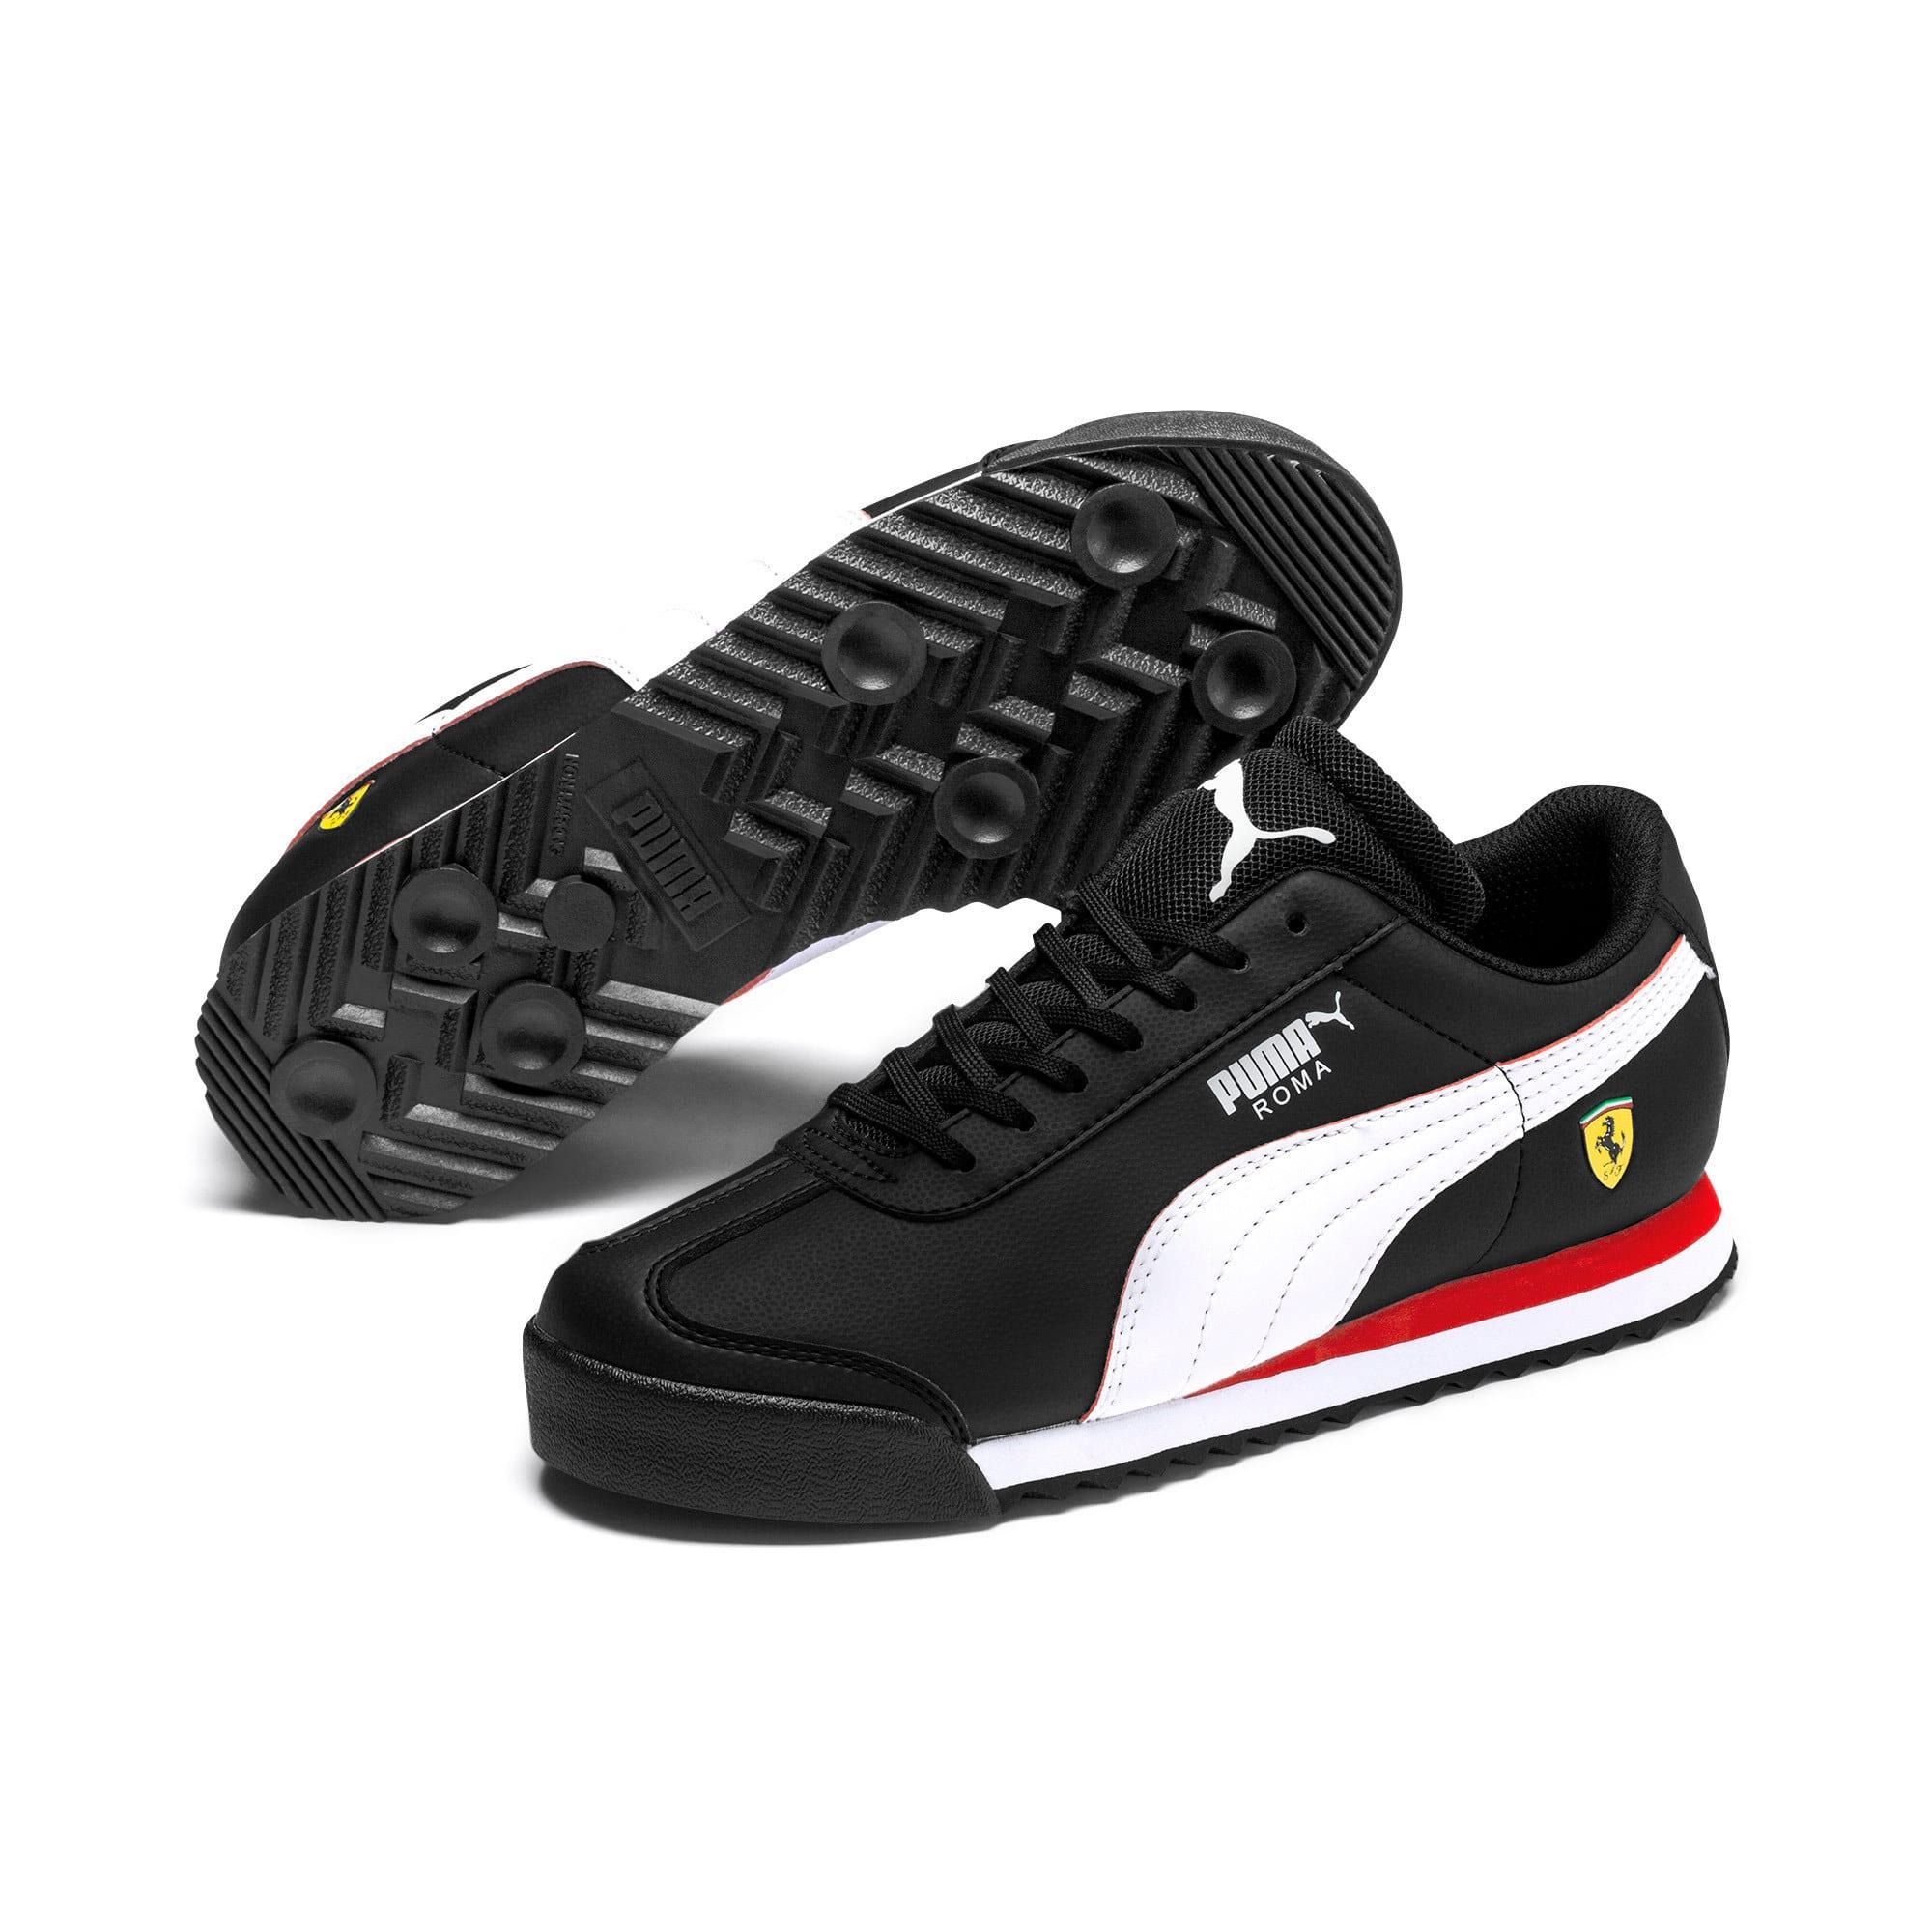 Thumbnail 2 of Scuderia Ferrari Roma Sneakers JR, Black-White-Rosso Corsa, medium